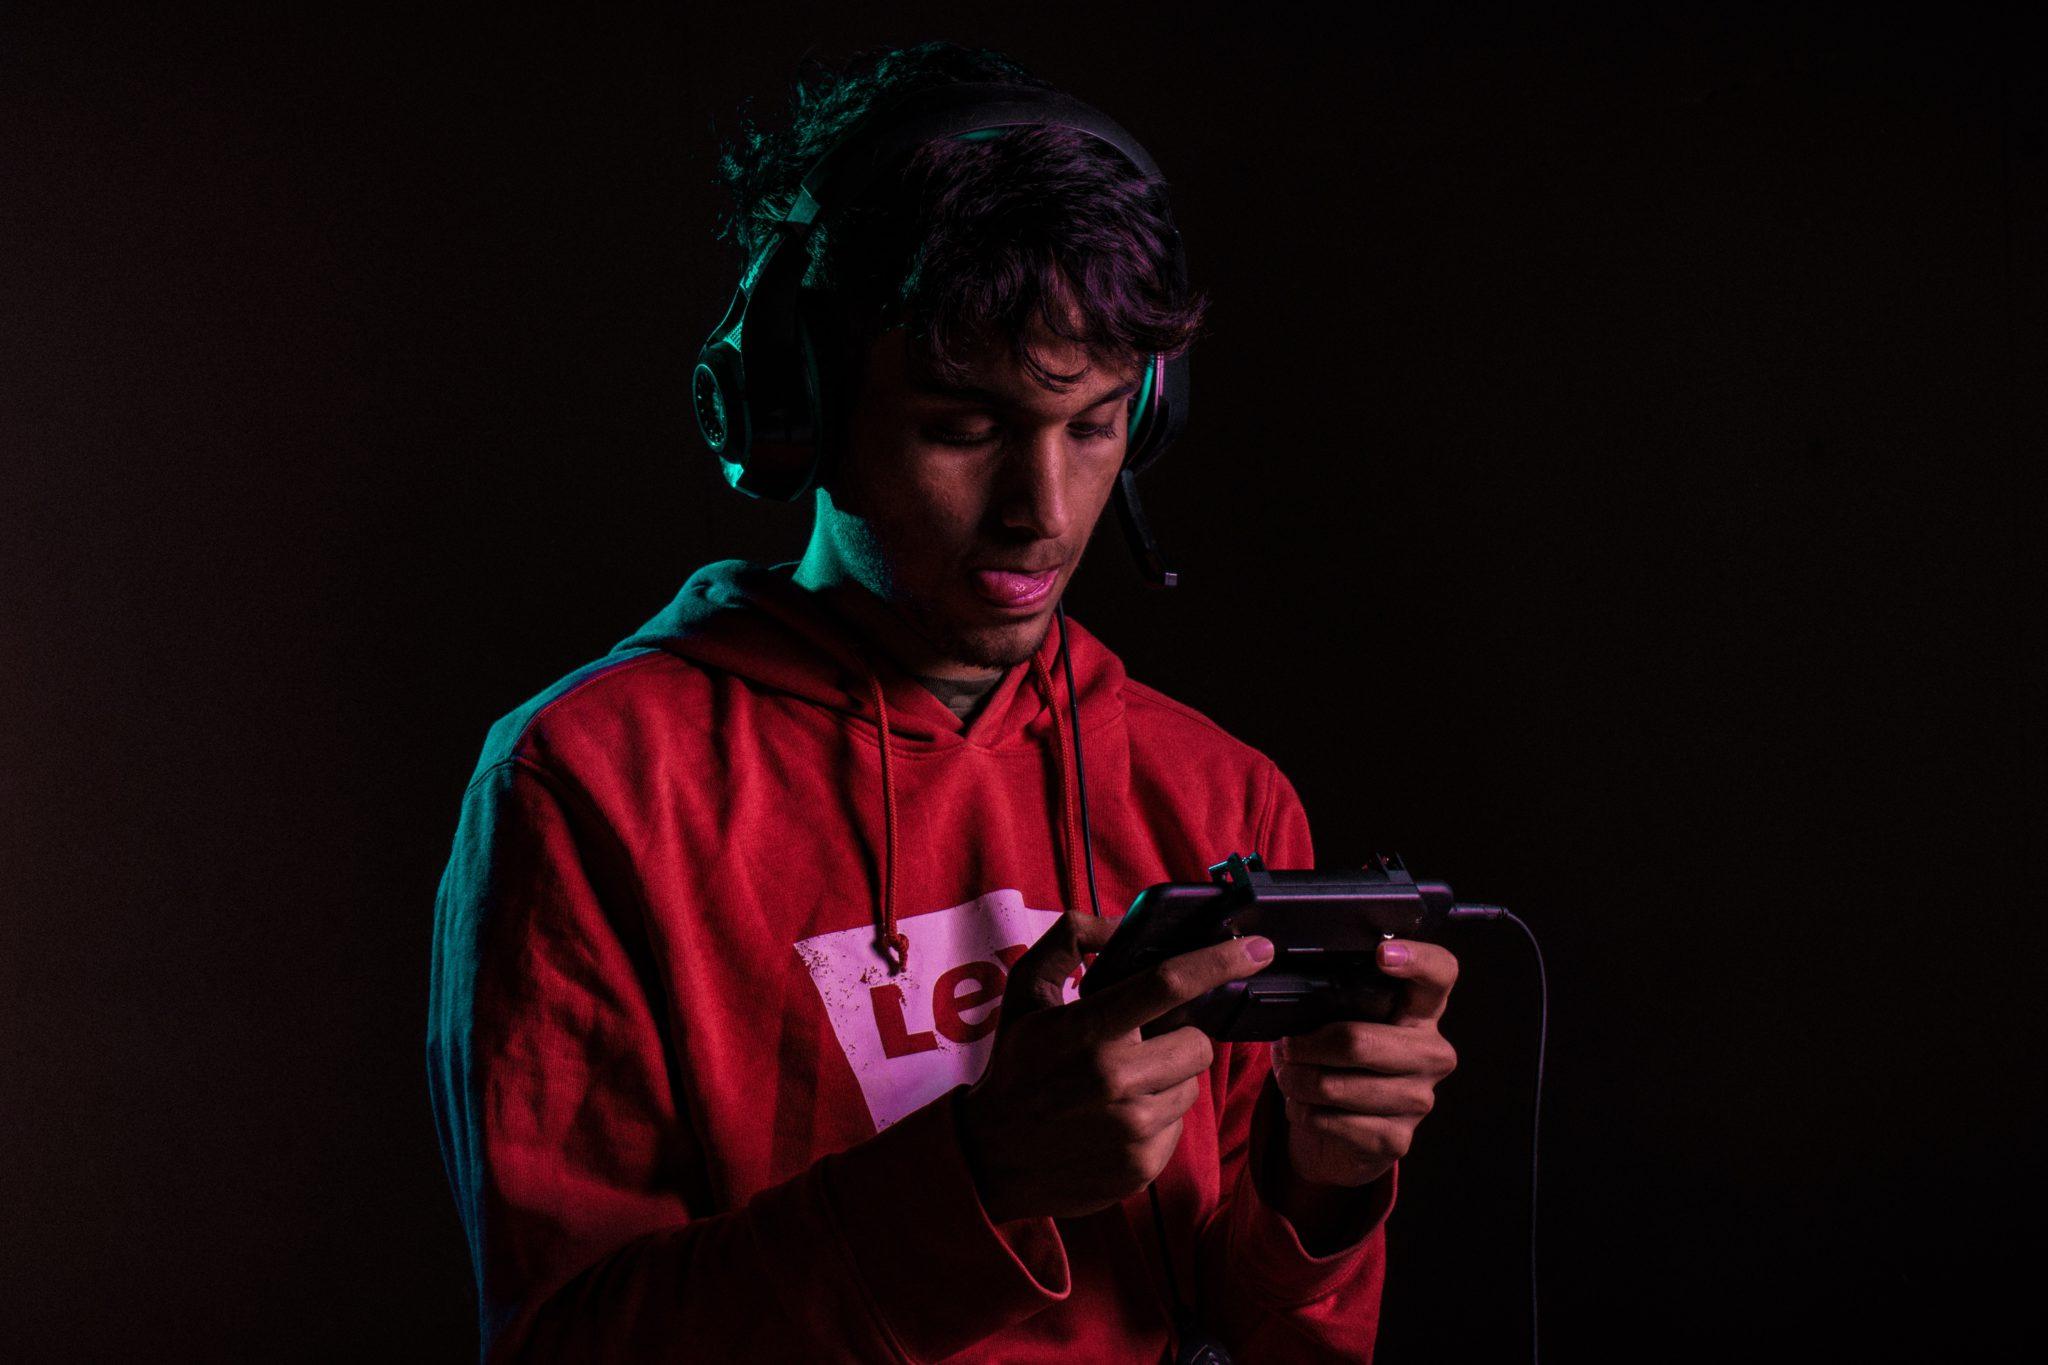 gameplay vidma screen recorder